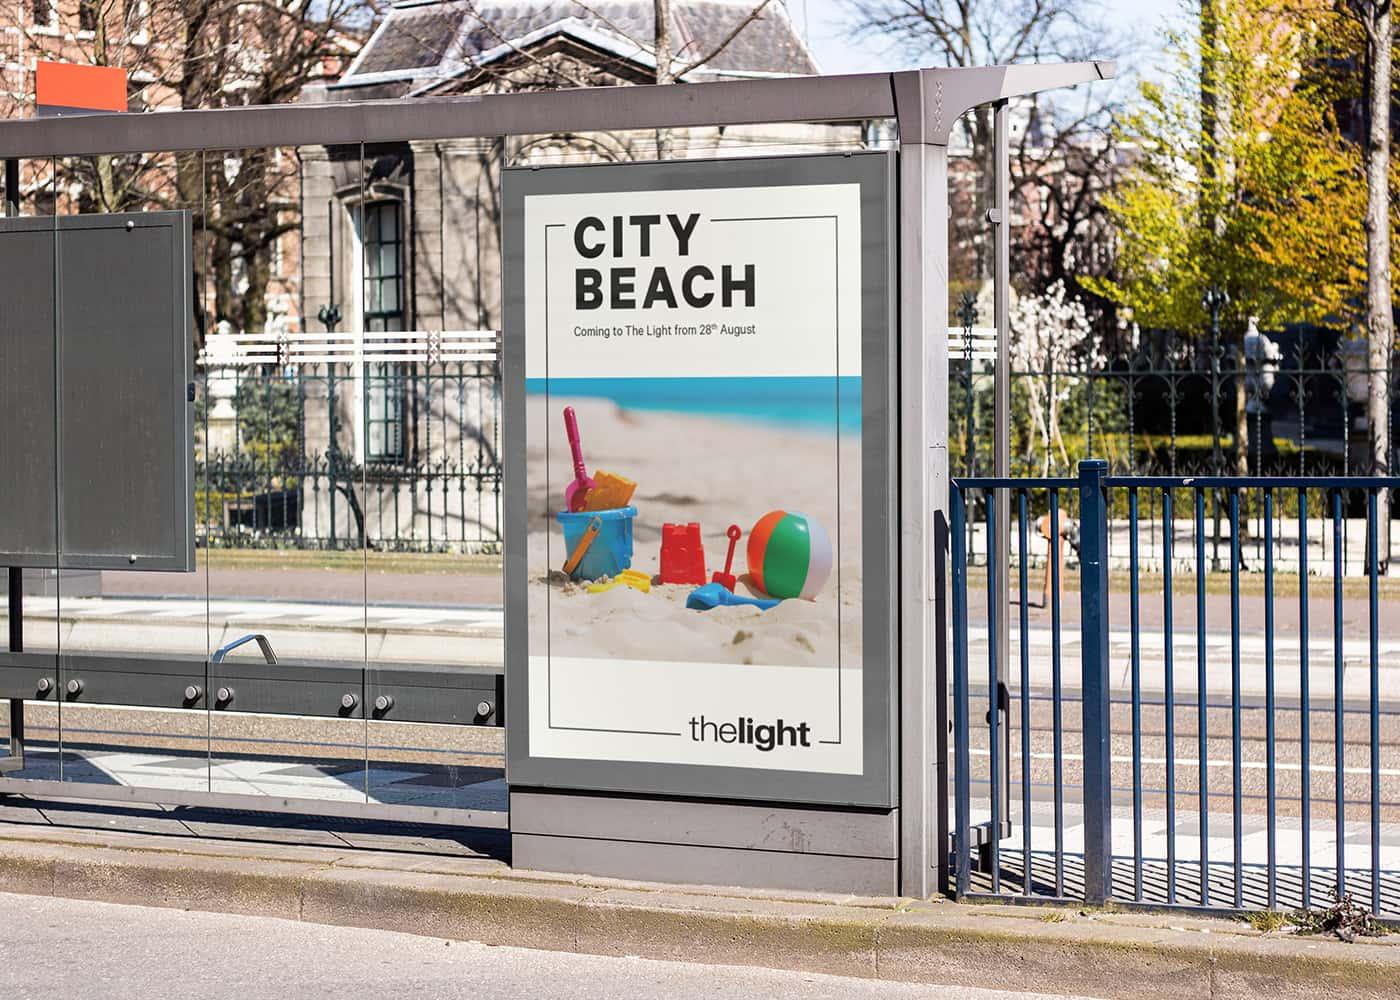 the light, city beach poster design